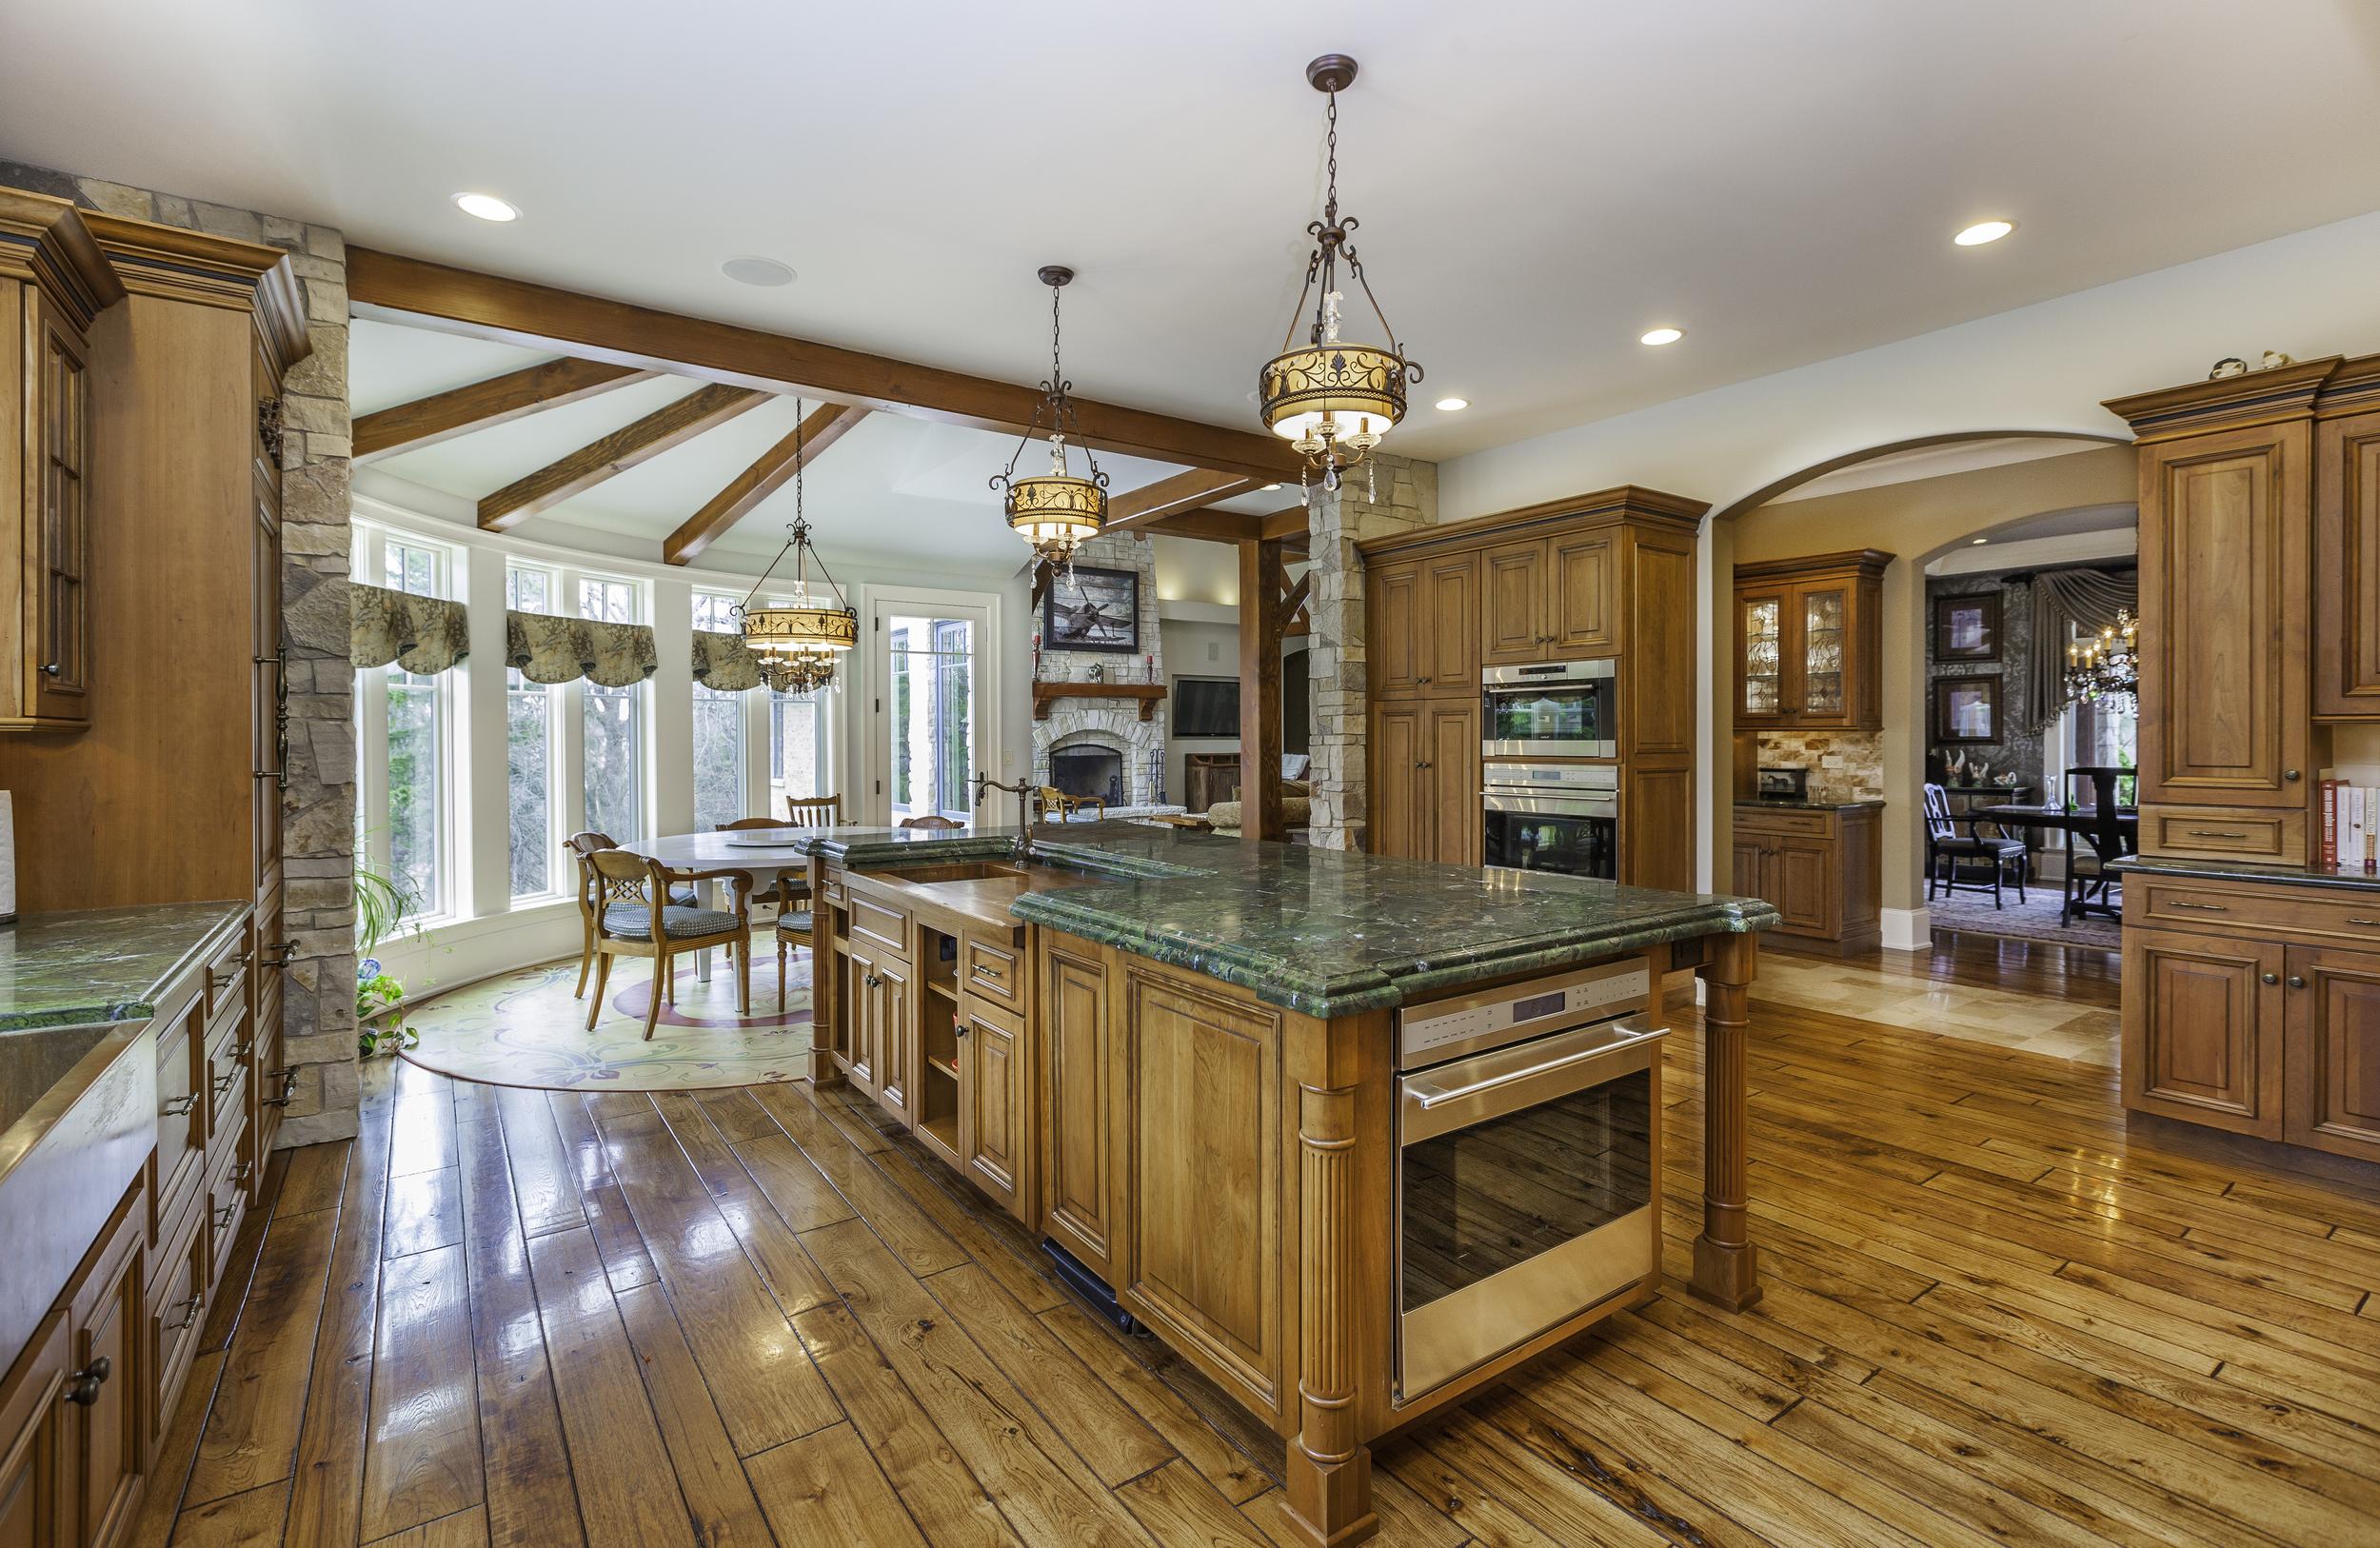 Trevor_muellner_kitchen4.jpg